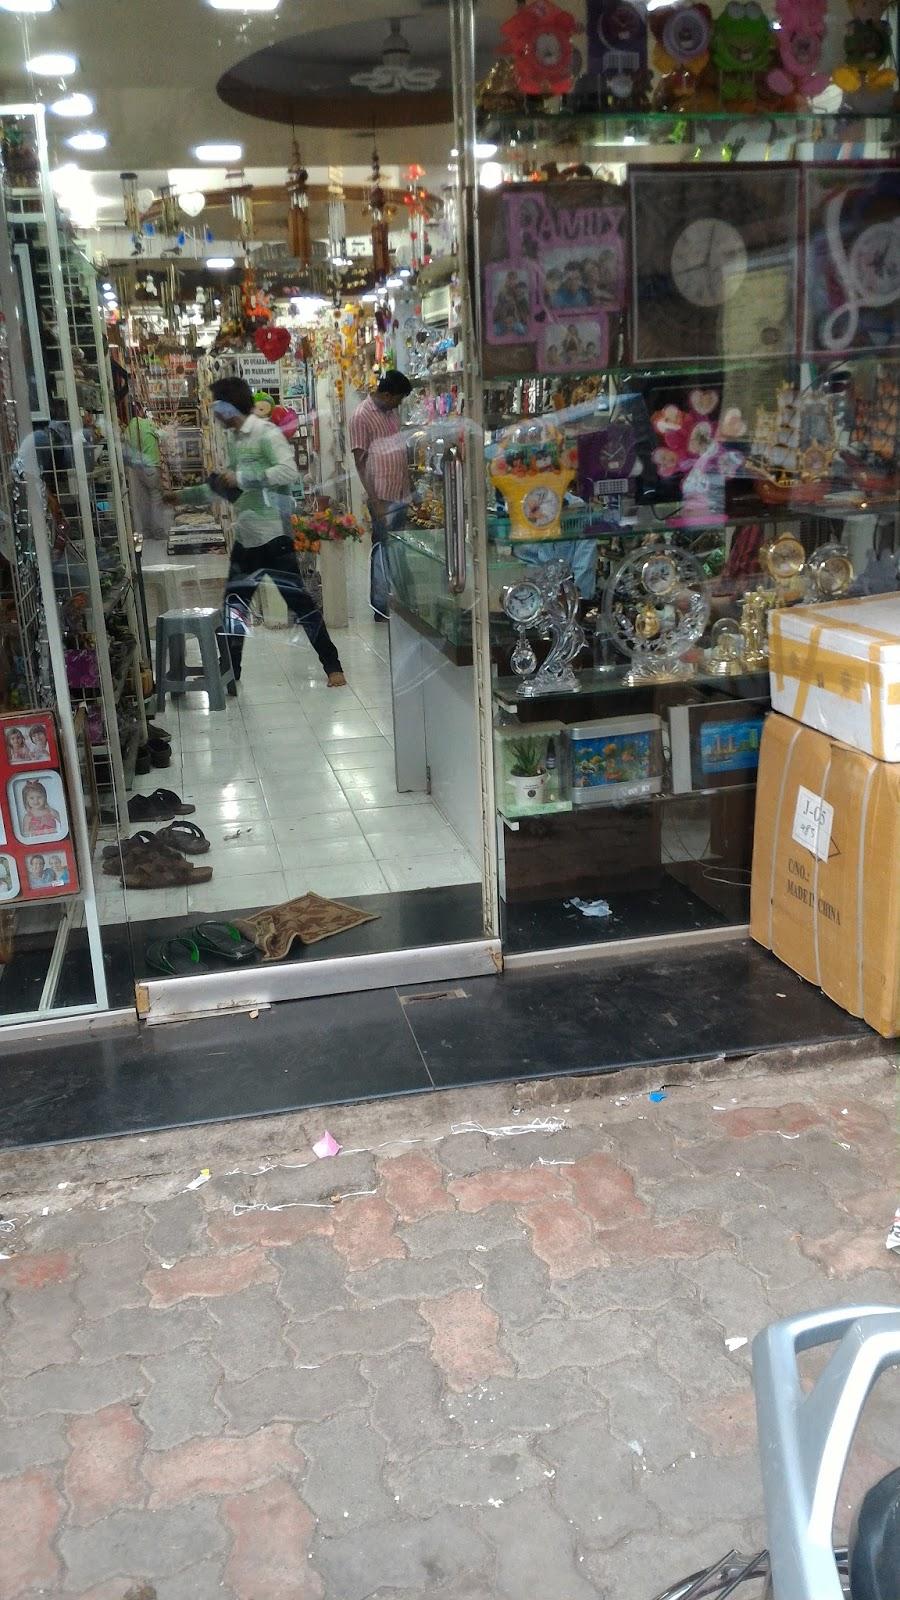 Vasker Blogpost Explore Wholesale Markets Of Mumbai